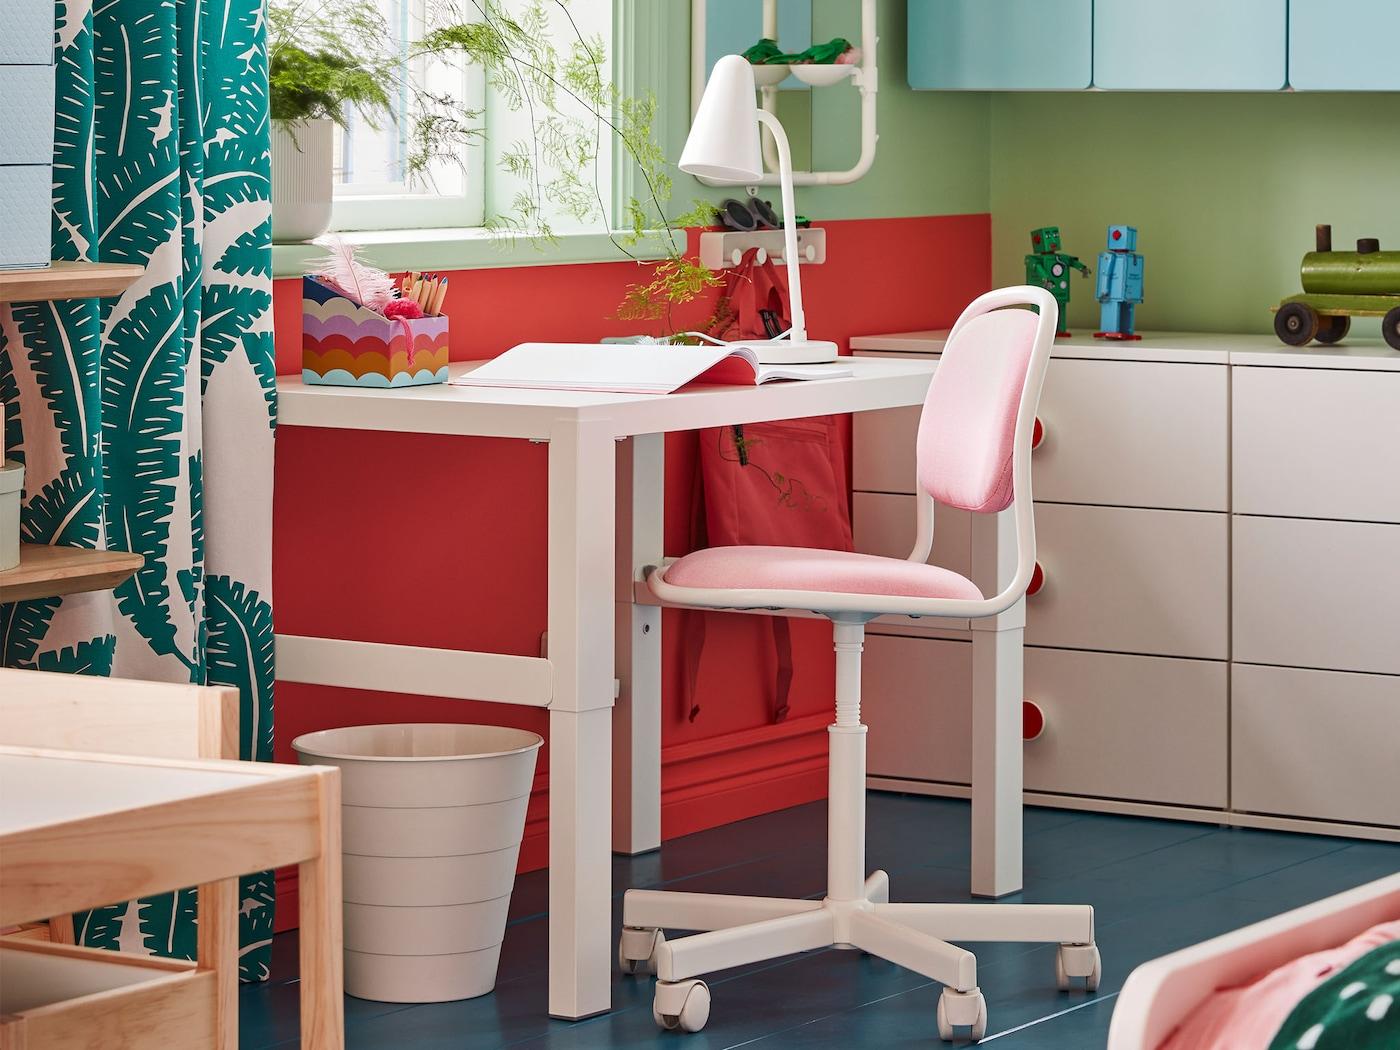 Study room - IKEA Malaysia